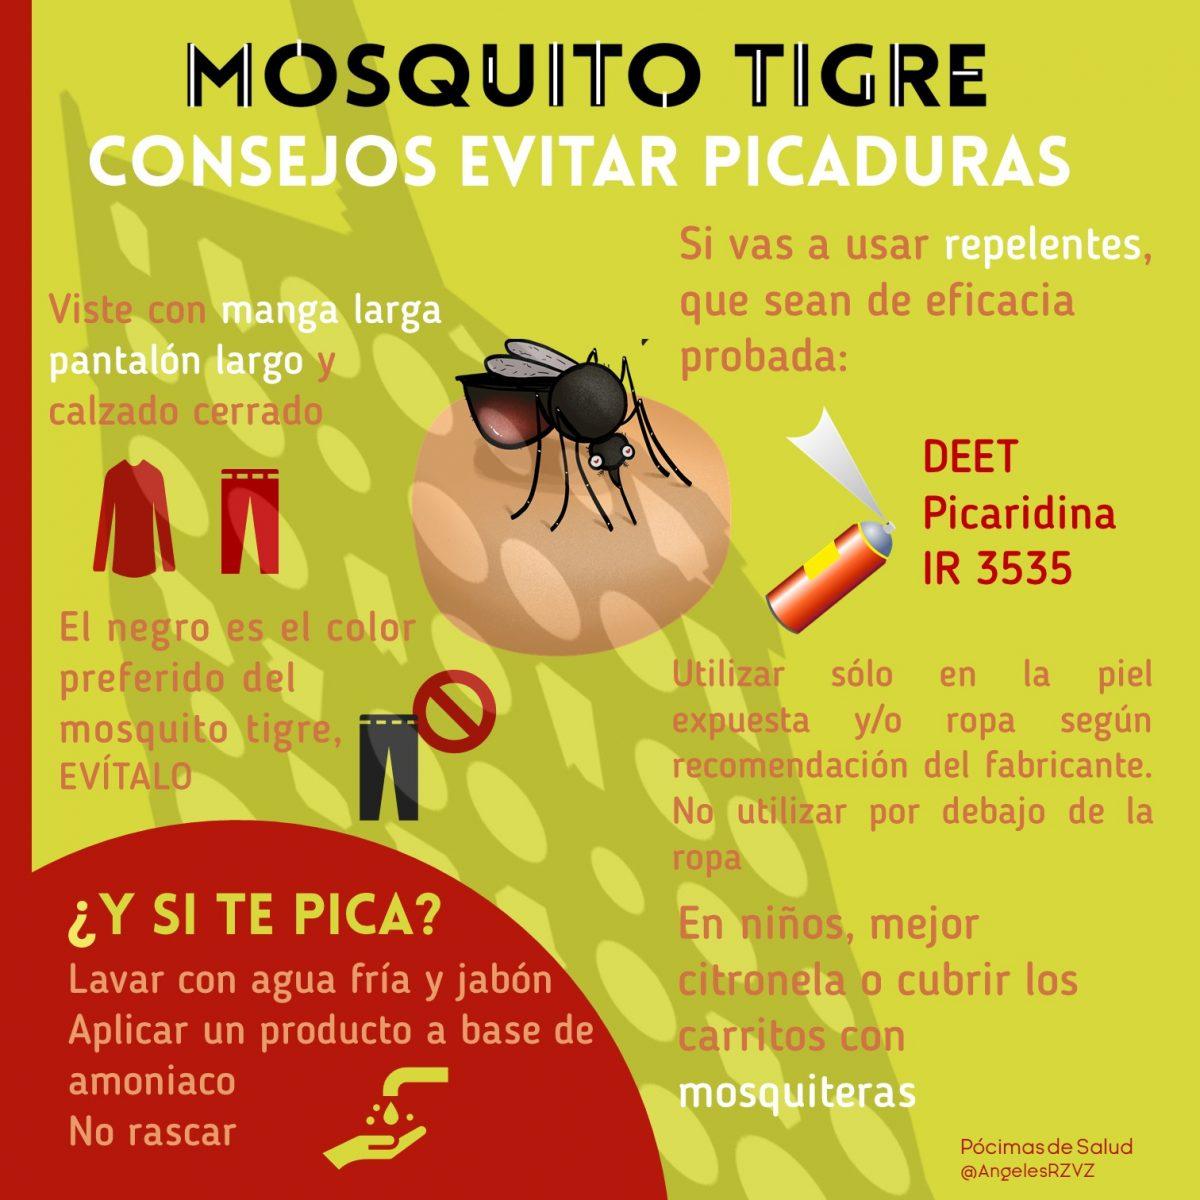 mosquito-tigre-consejos-evitar-picaduras-